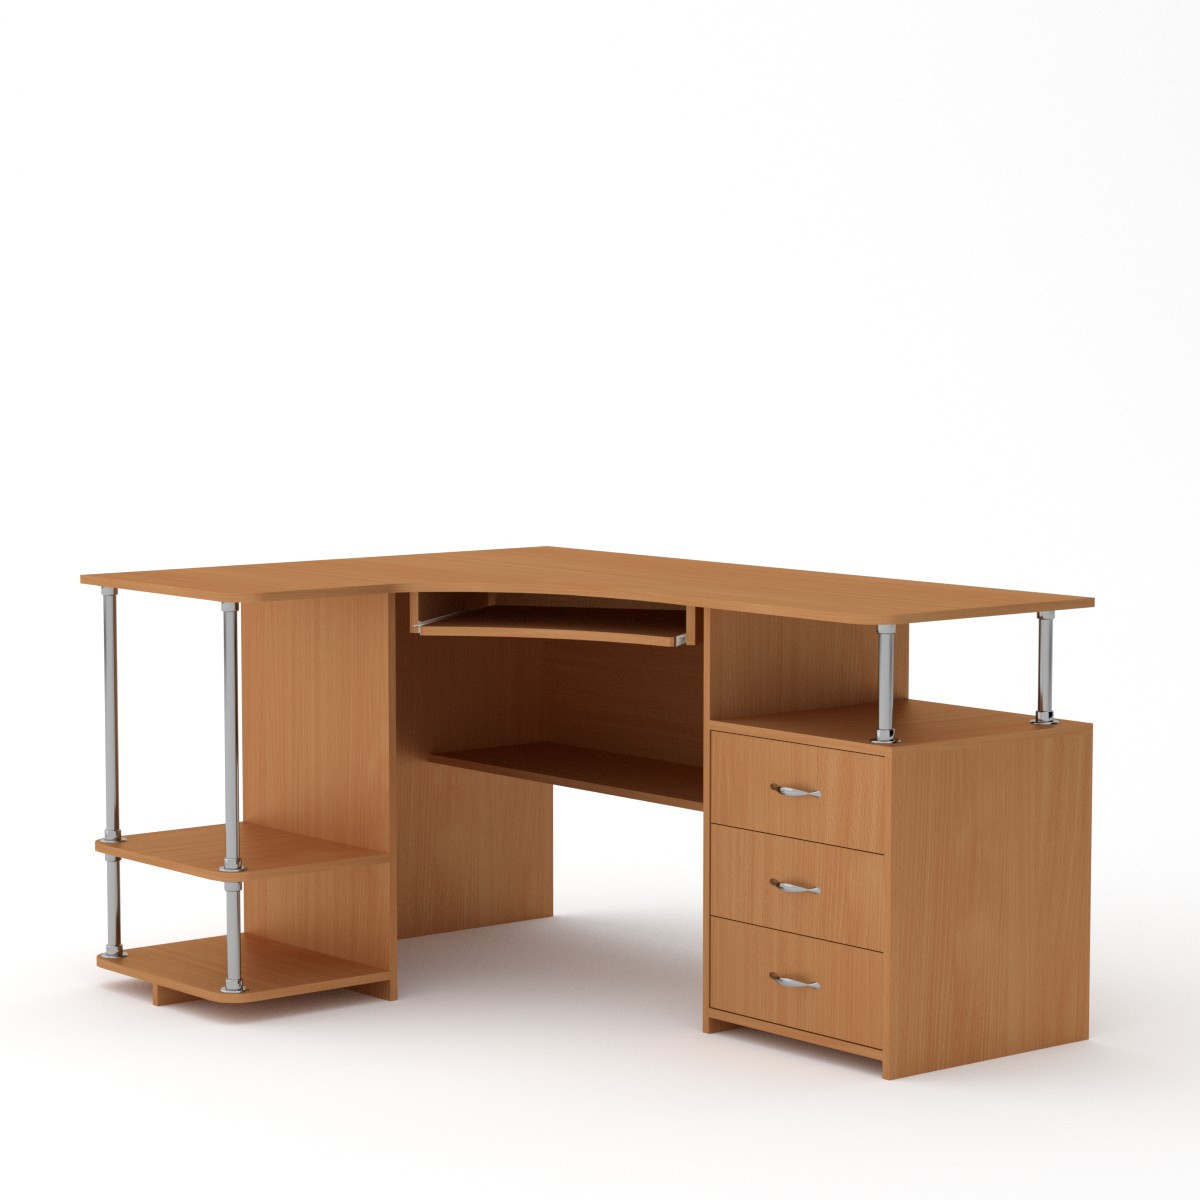 Стол компьютерный СУ-4 (кромка АБС - 2мм) бук Компанит (150х110х77 см)